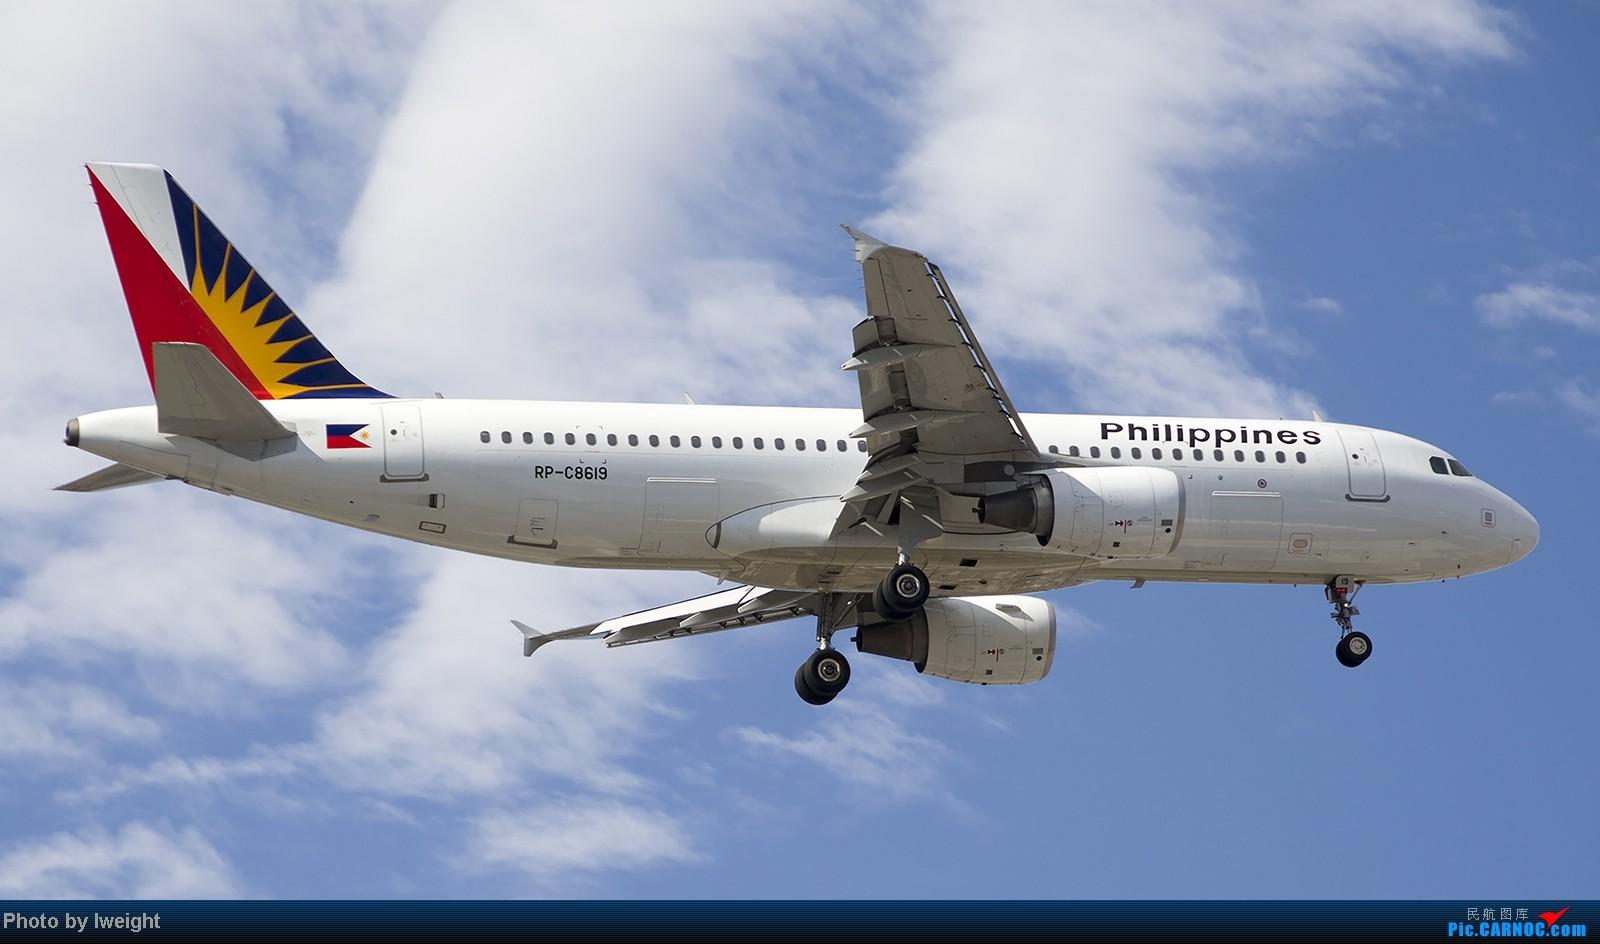 Re:[原创]终于盼来了晴天,PEK拍起【10月26日】 AIRBUS A320 RP-C8619 中国北京首都机场